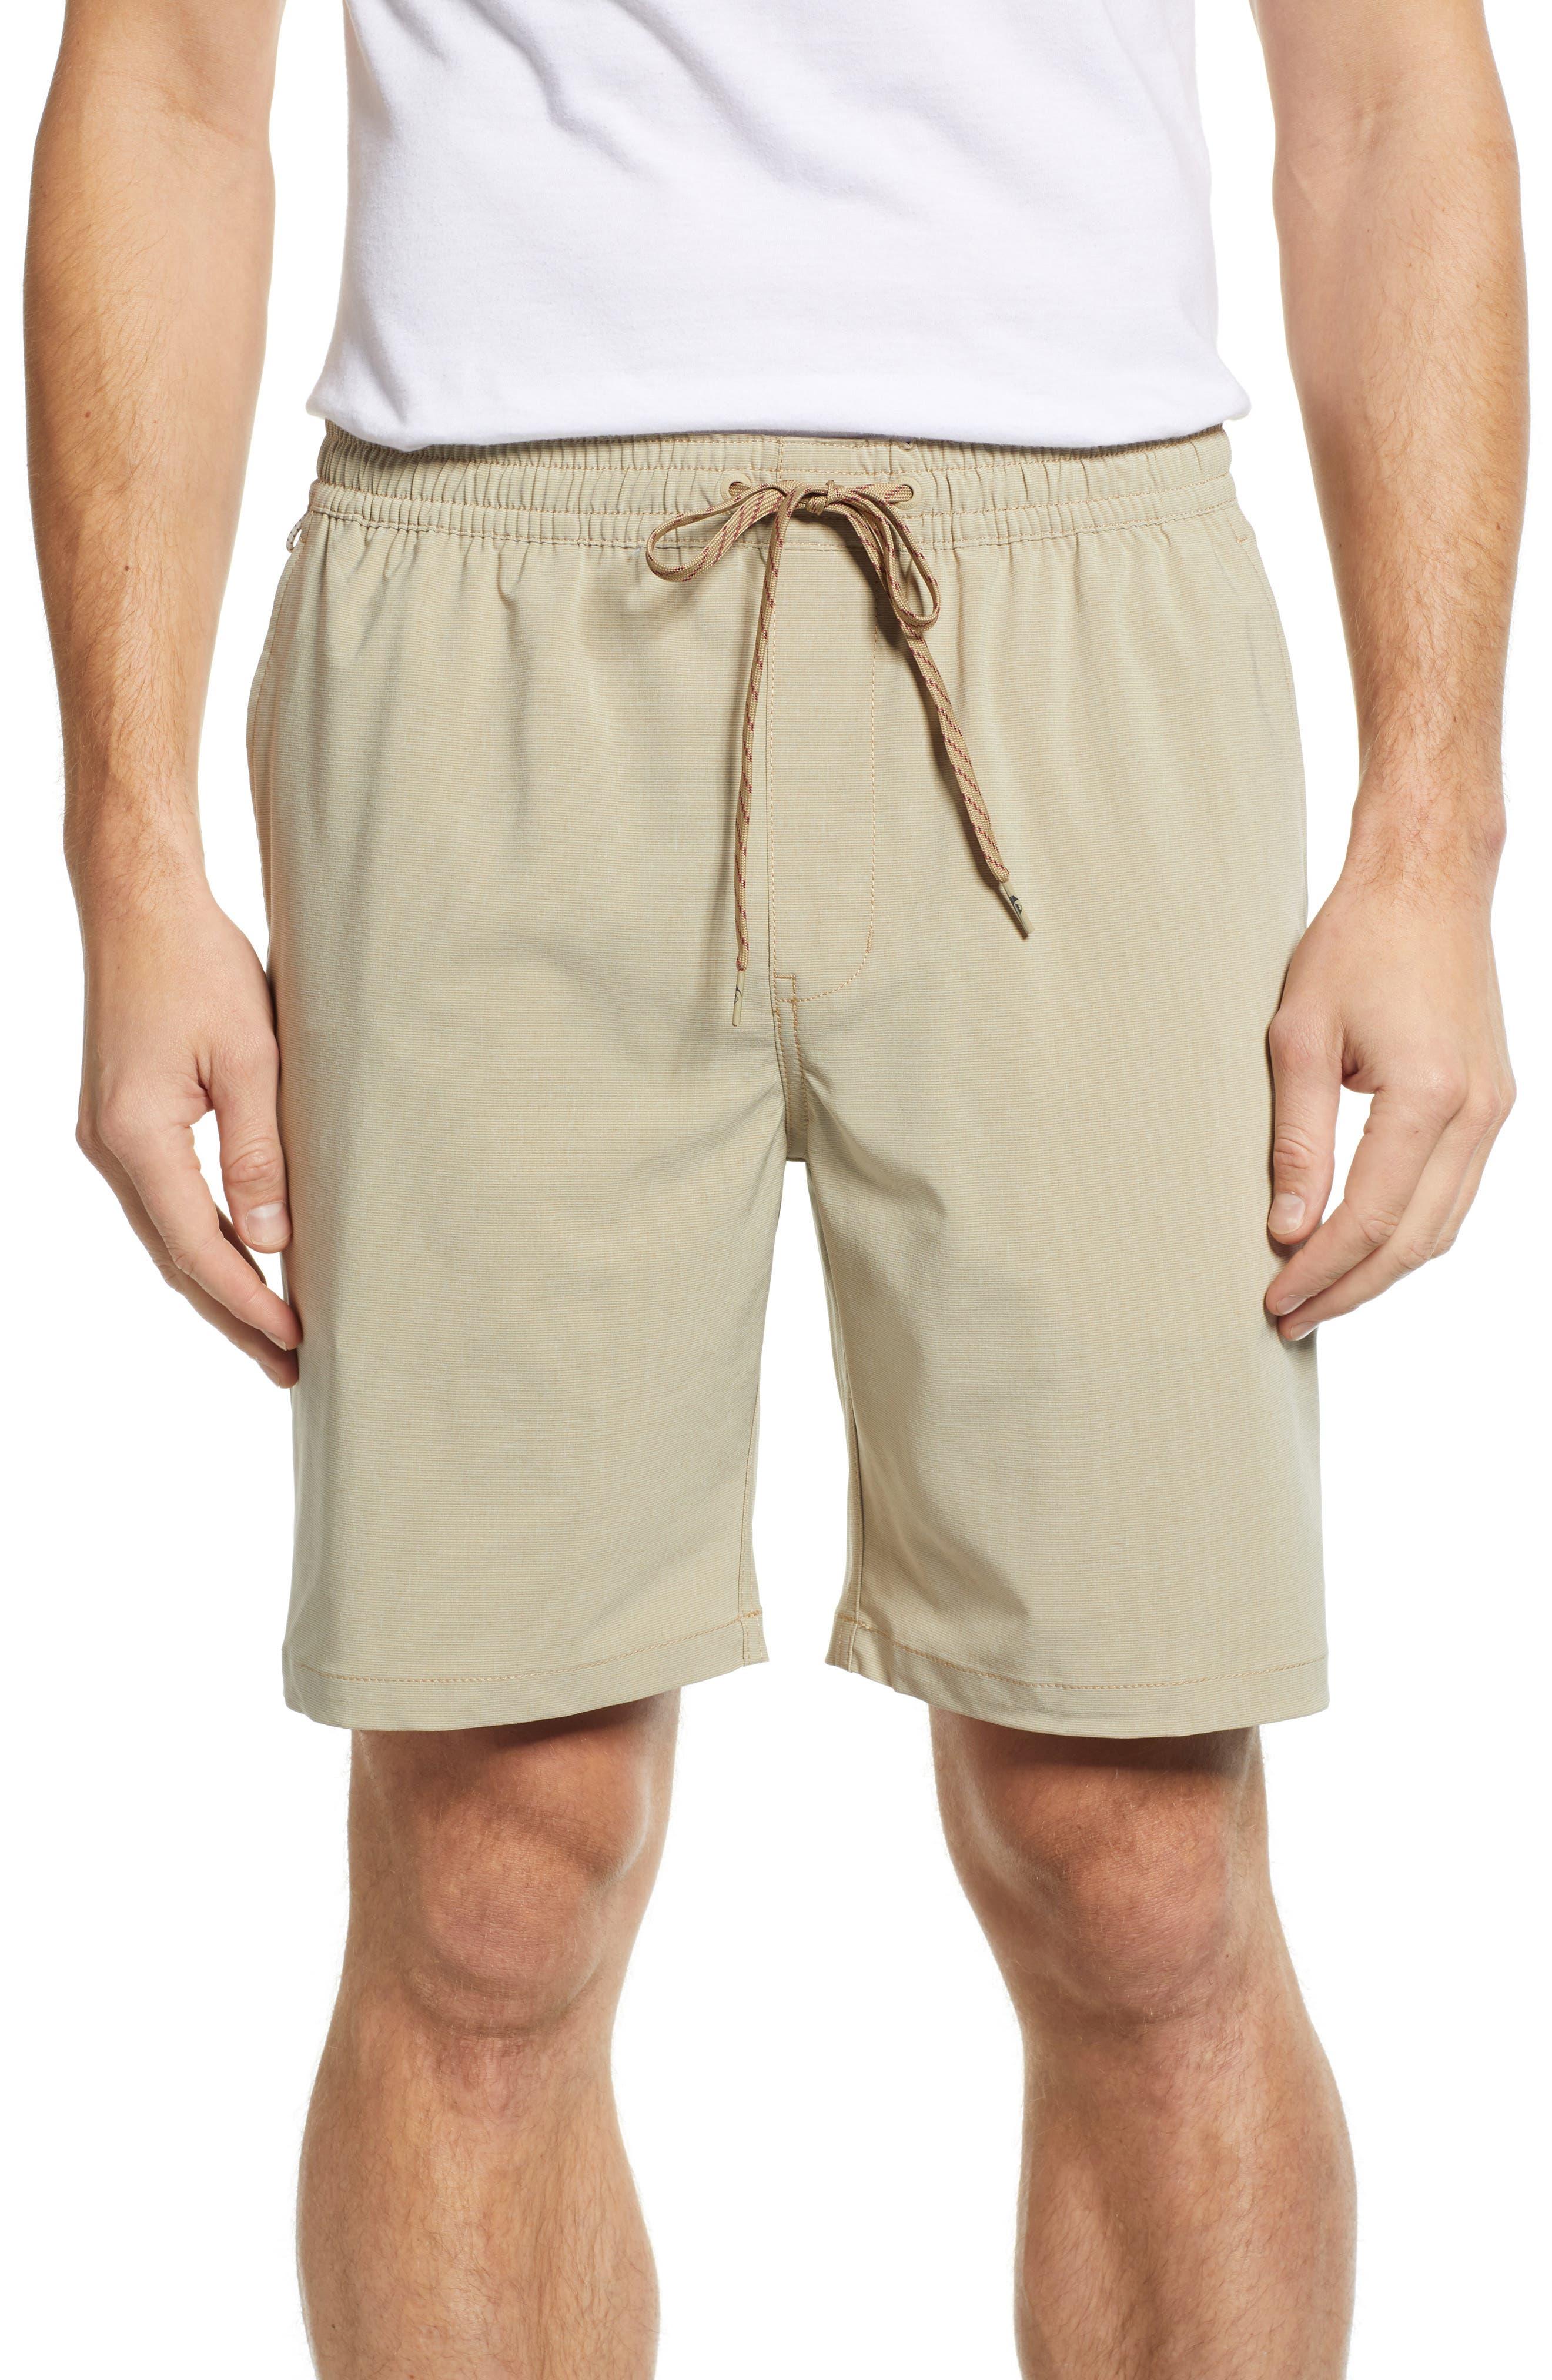 QUIKSILVER WATERMAN COLLECTION,                             Suva Amphibian Hybrid Shorts,                             Main thumbnail 1, color,                             TWILL